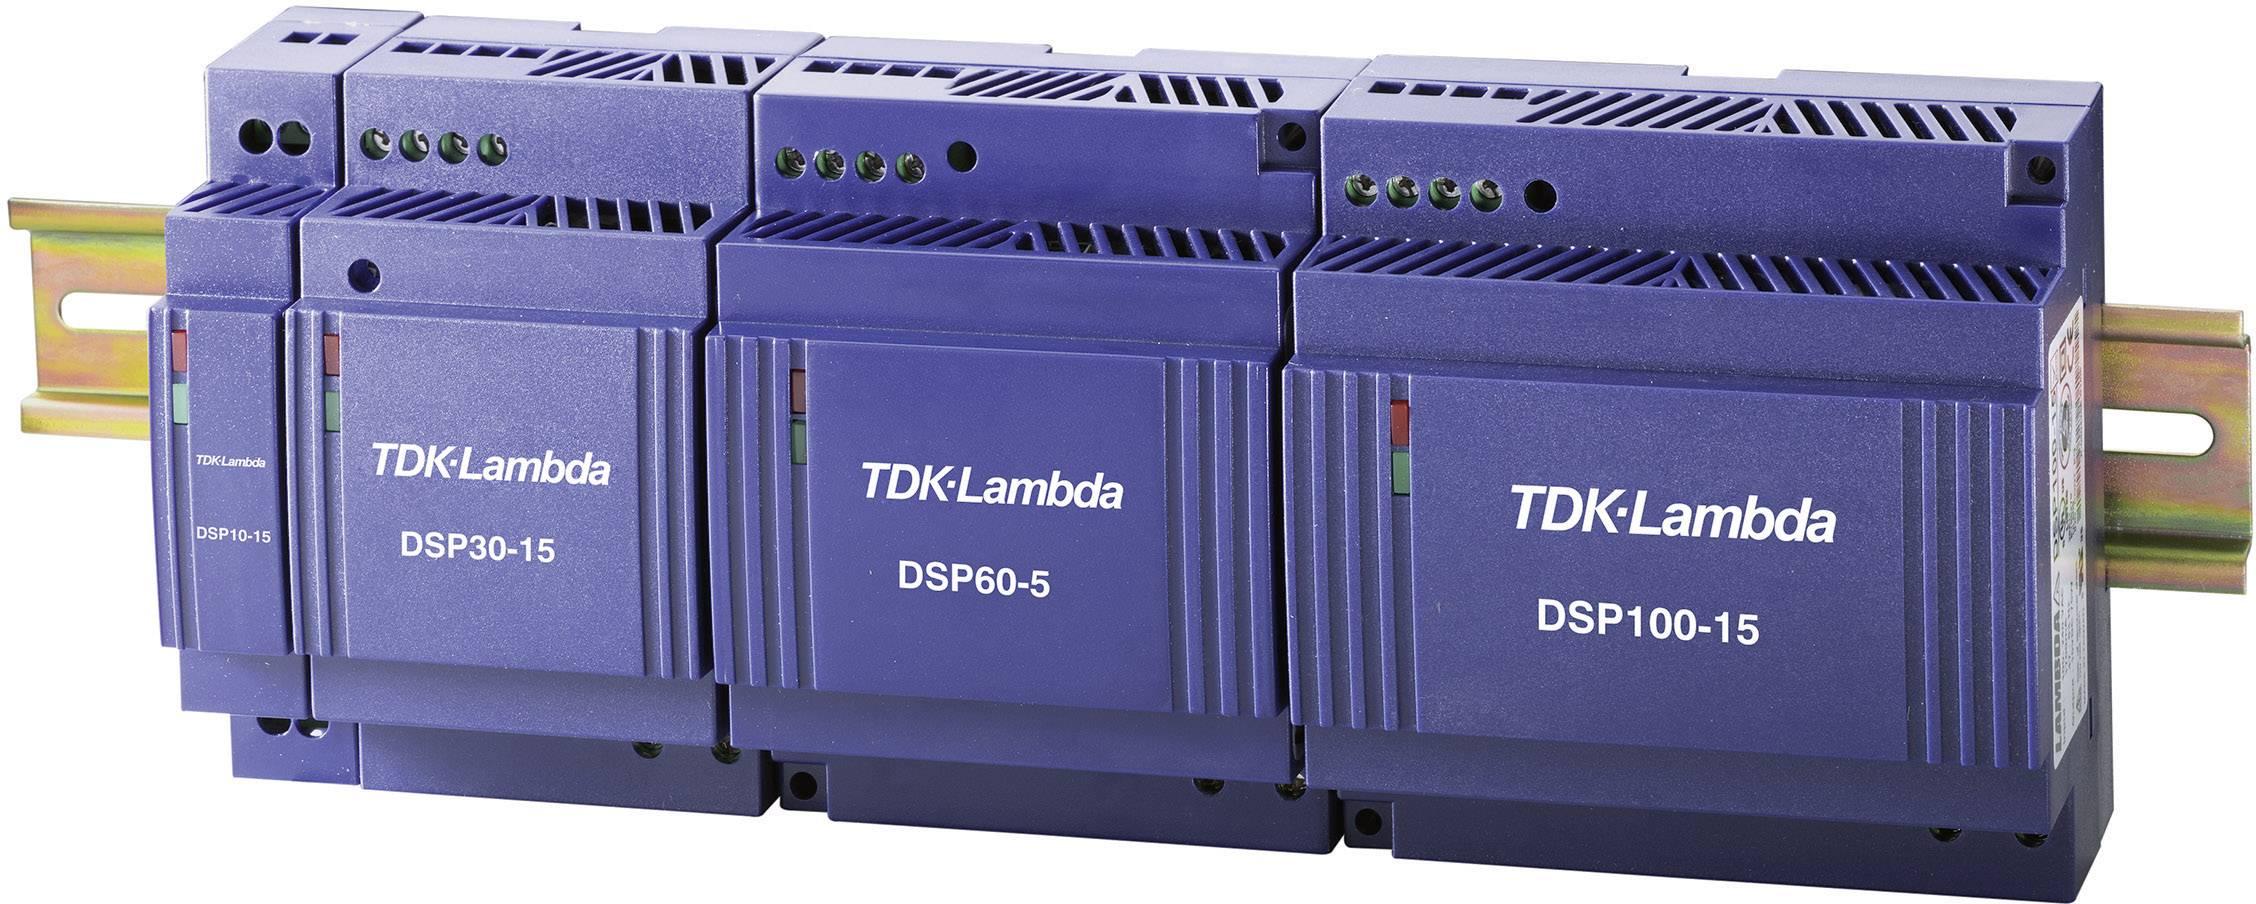 Sieťový zdroj na montážnu lištu (DIN lištu) TDK-Lambda DSP-10-12, 1 x, 12 V/DC, 0.83 A, 10 W